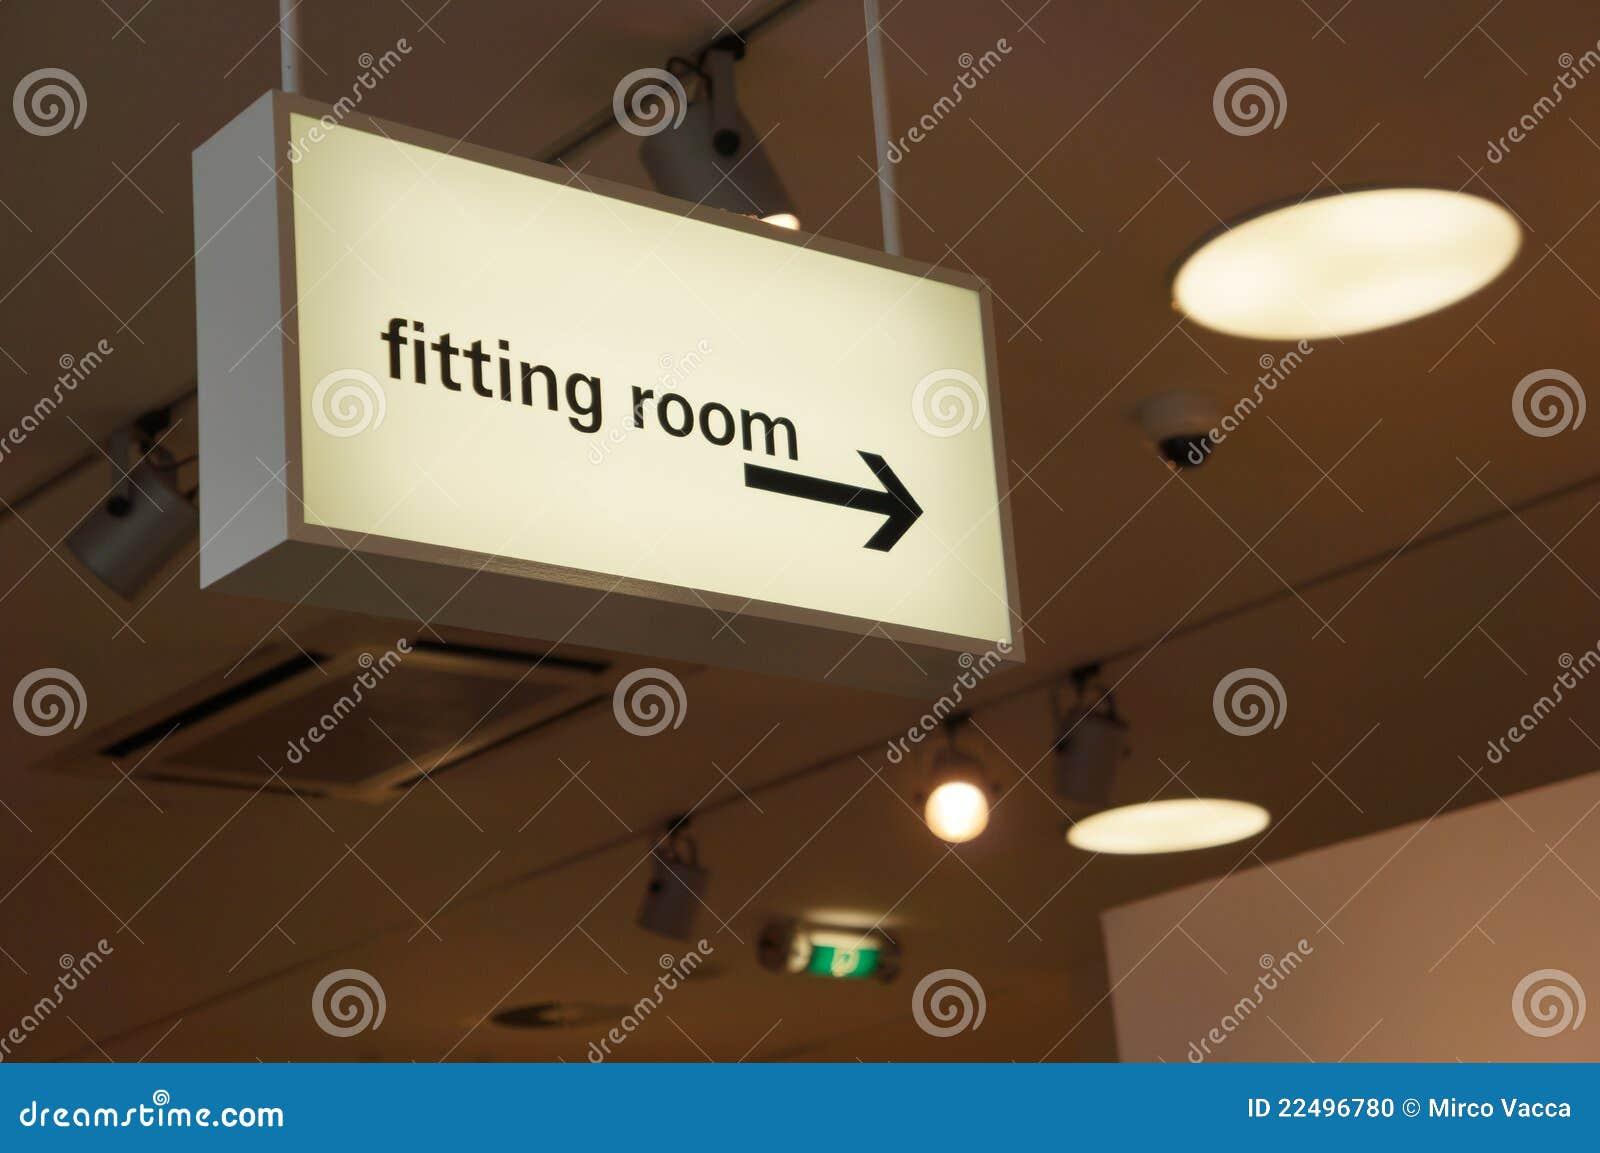 Fitting Room Design